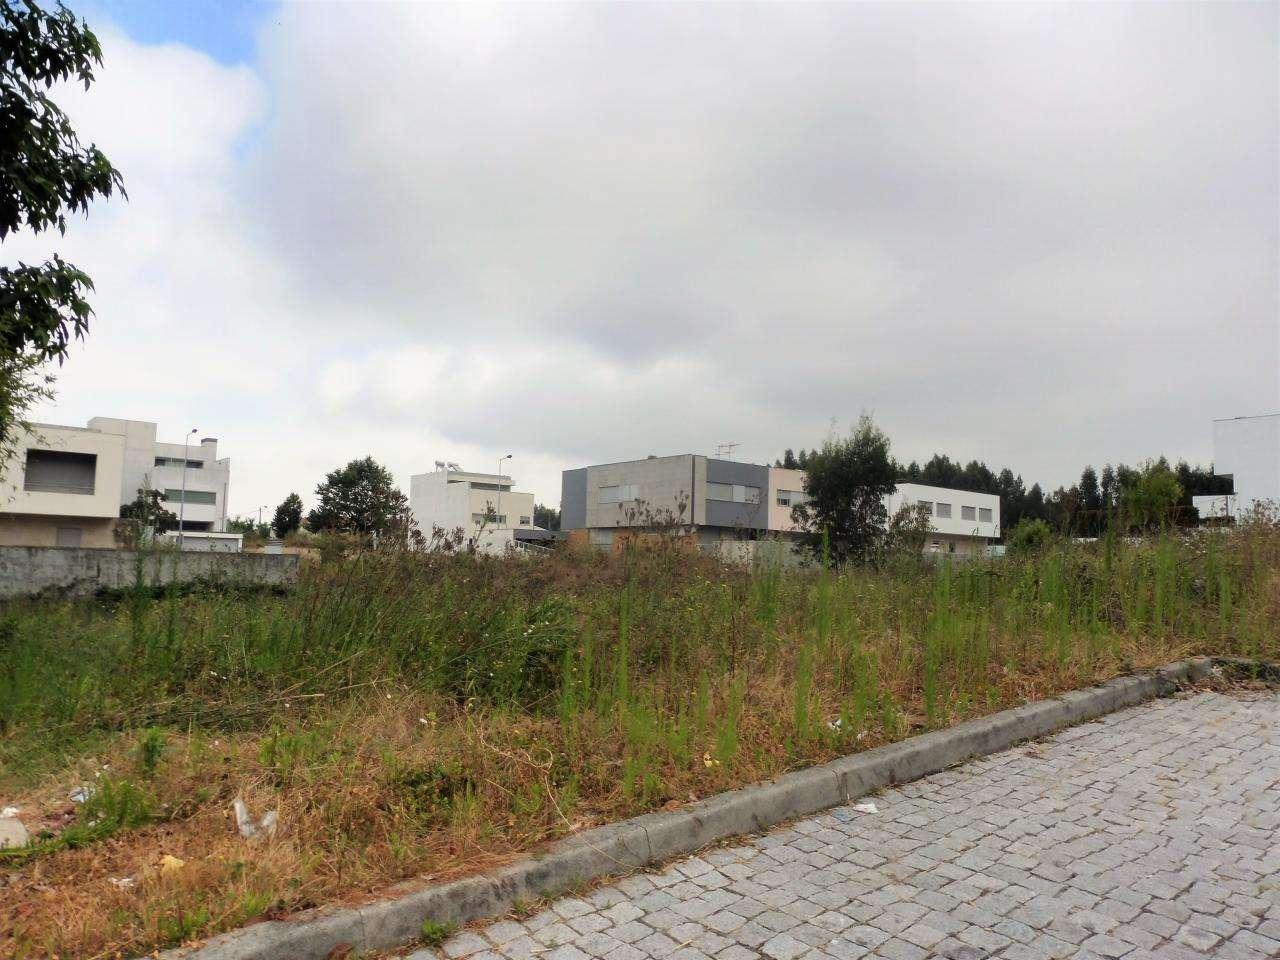 Terreno para comprar, Castêlo da Maia, Maia, Porto - Foto 1